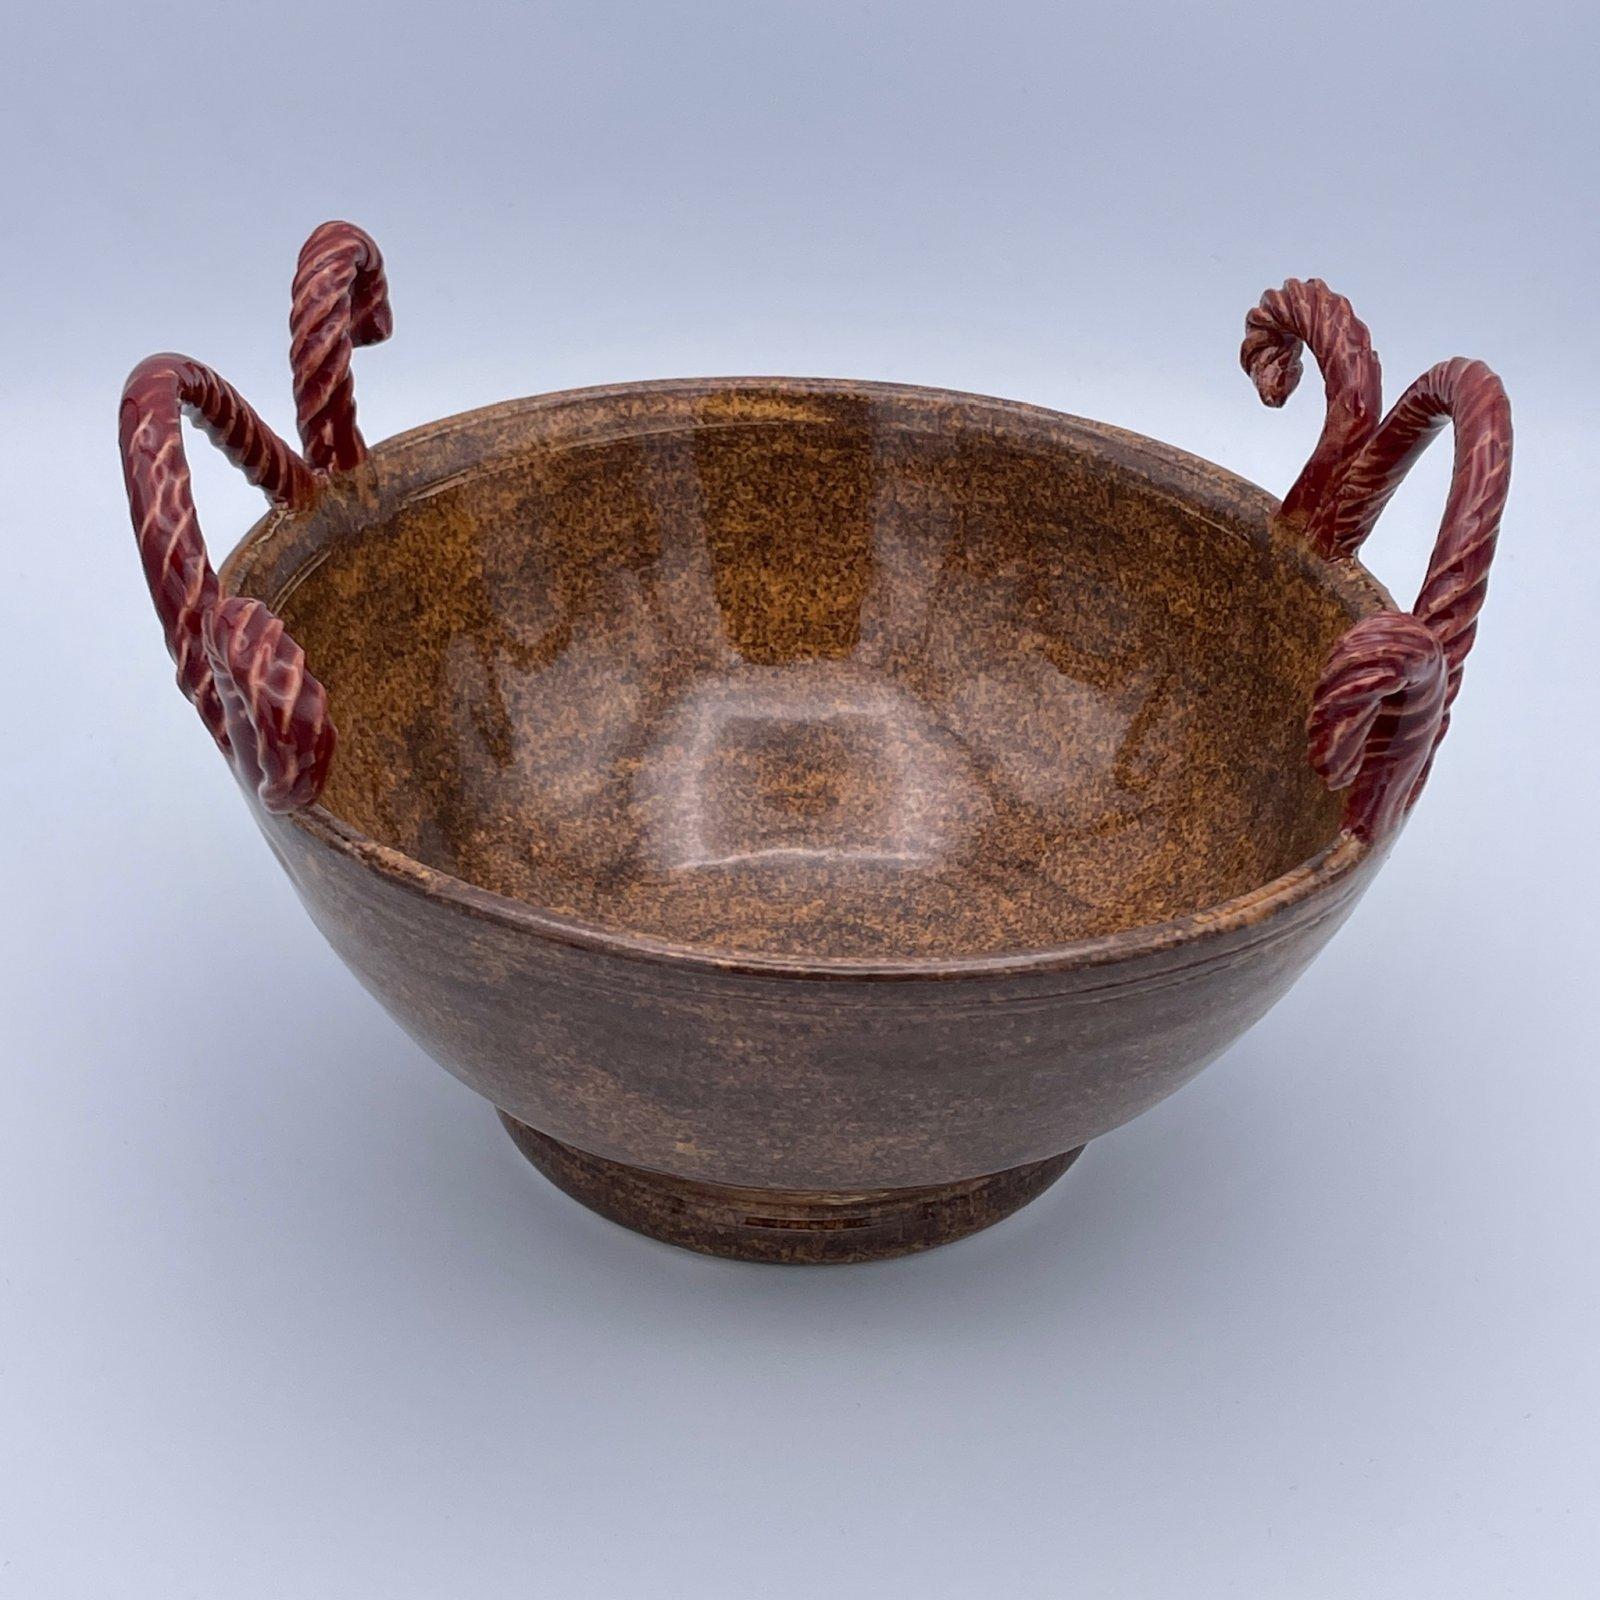 Yarn Pottery - Rope Handle Bowl - Amy Fox Designs